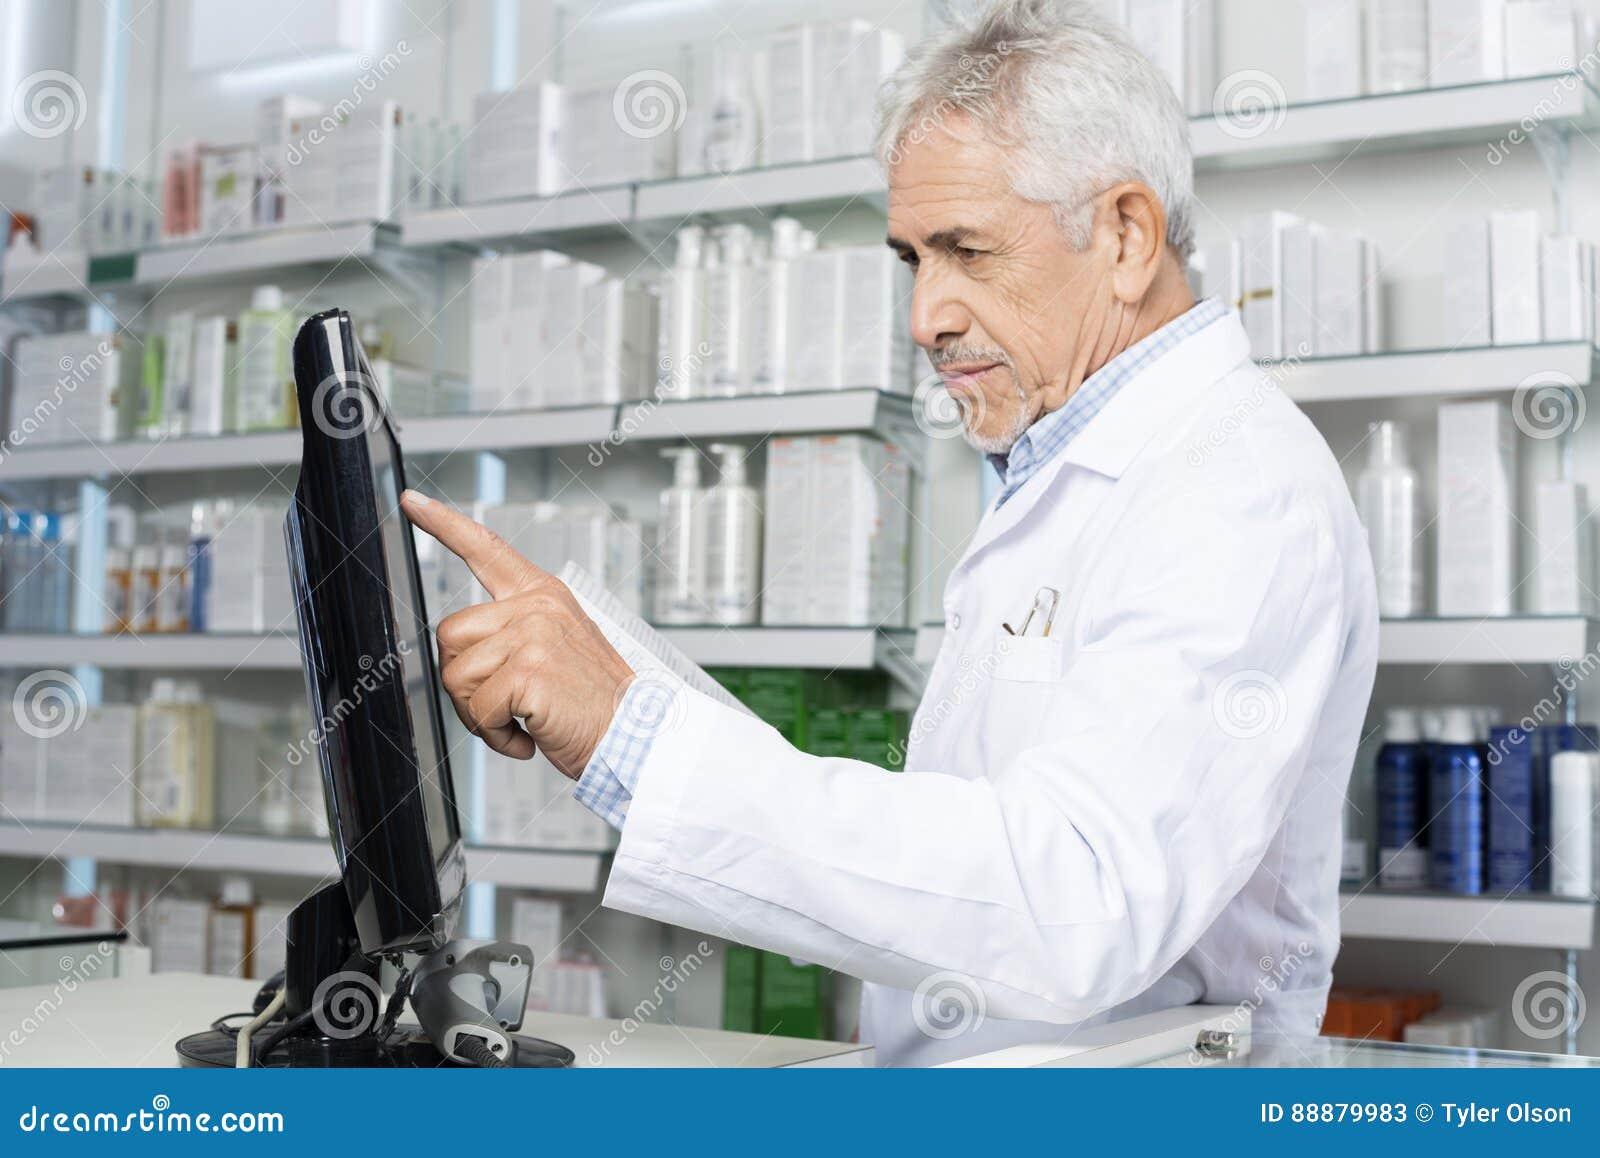 Mannelijke Apotheker Touching Monitor Screen in Apotheek